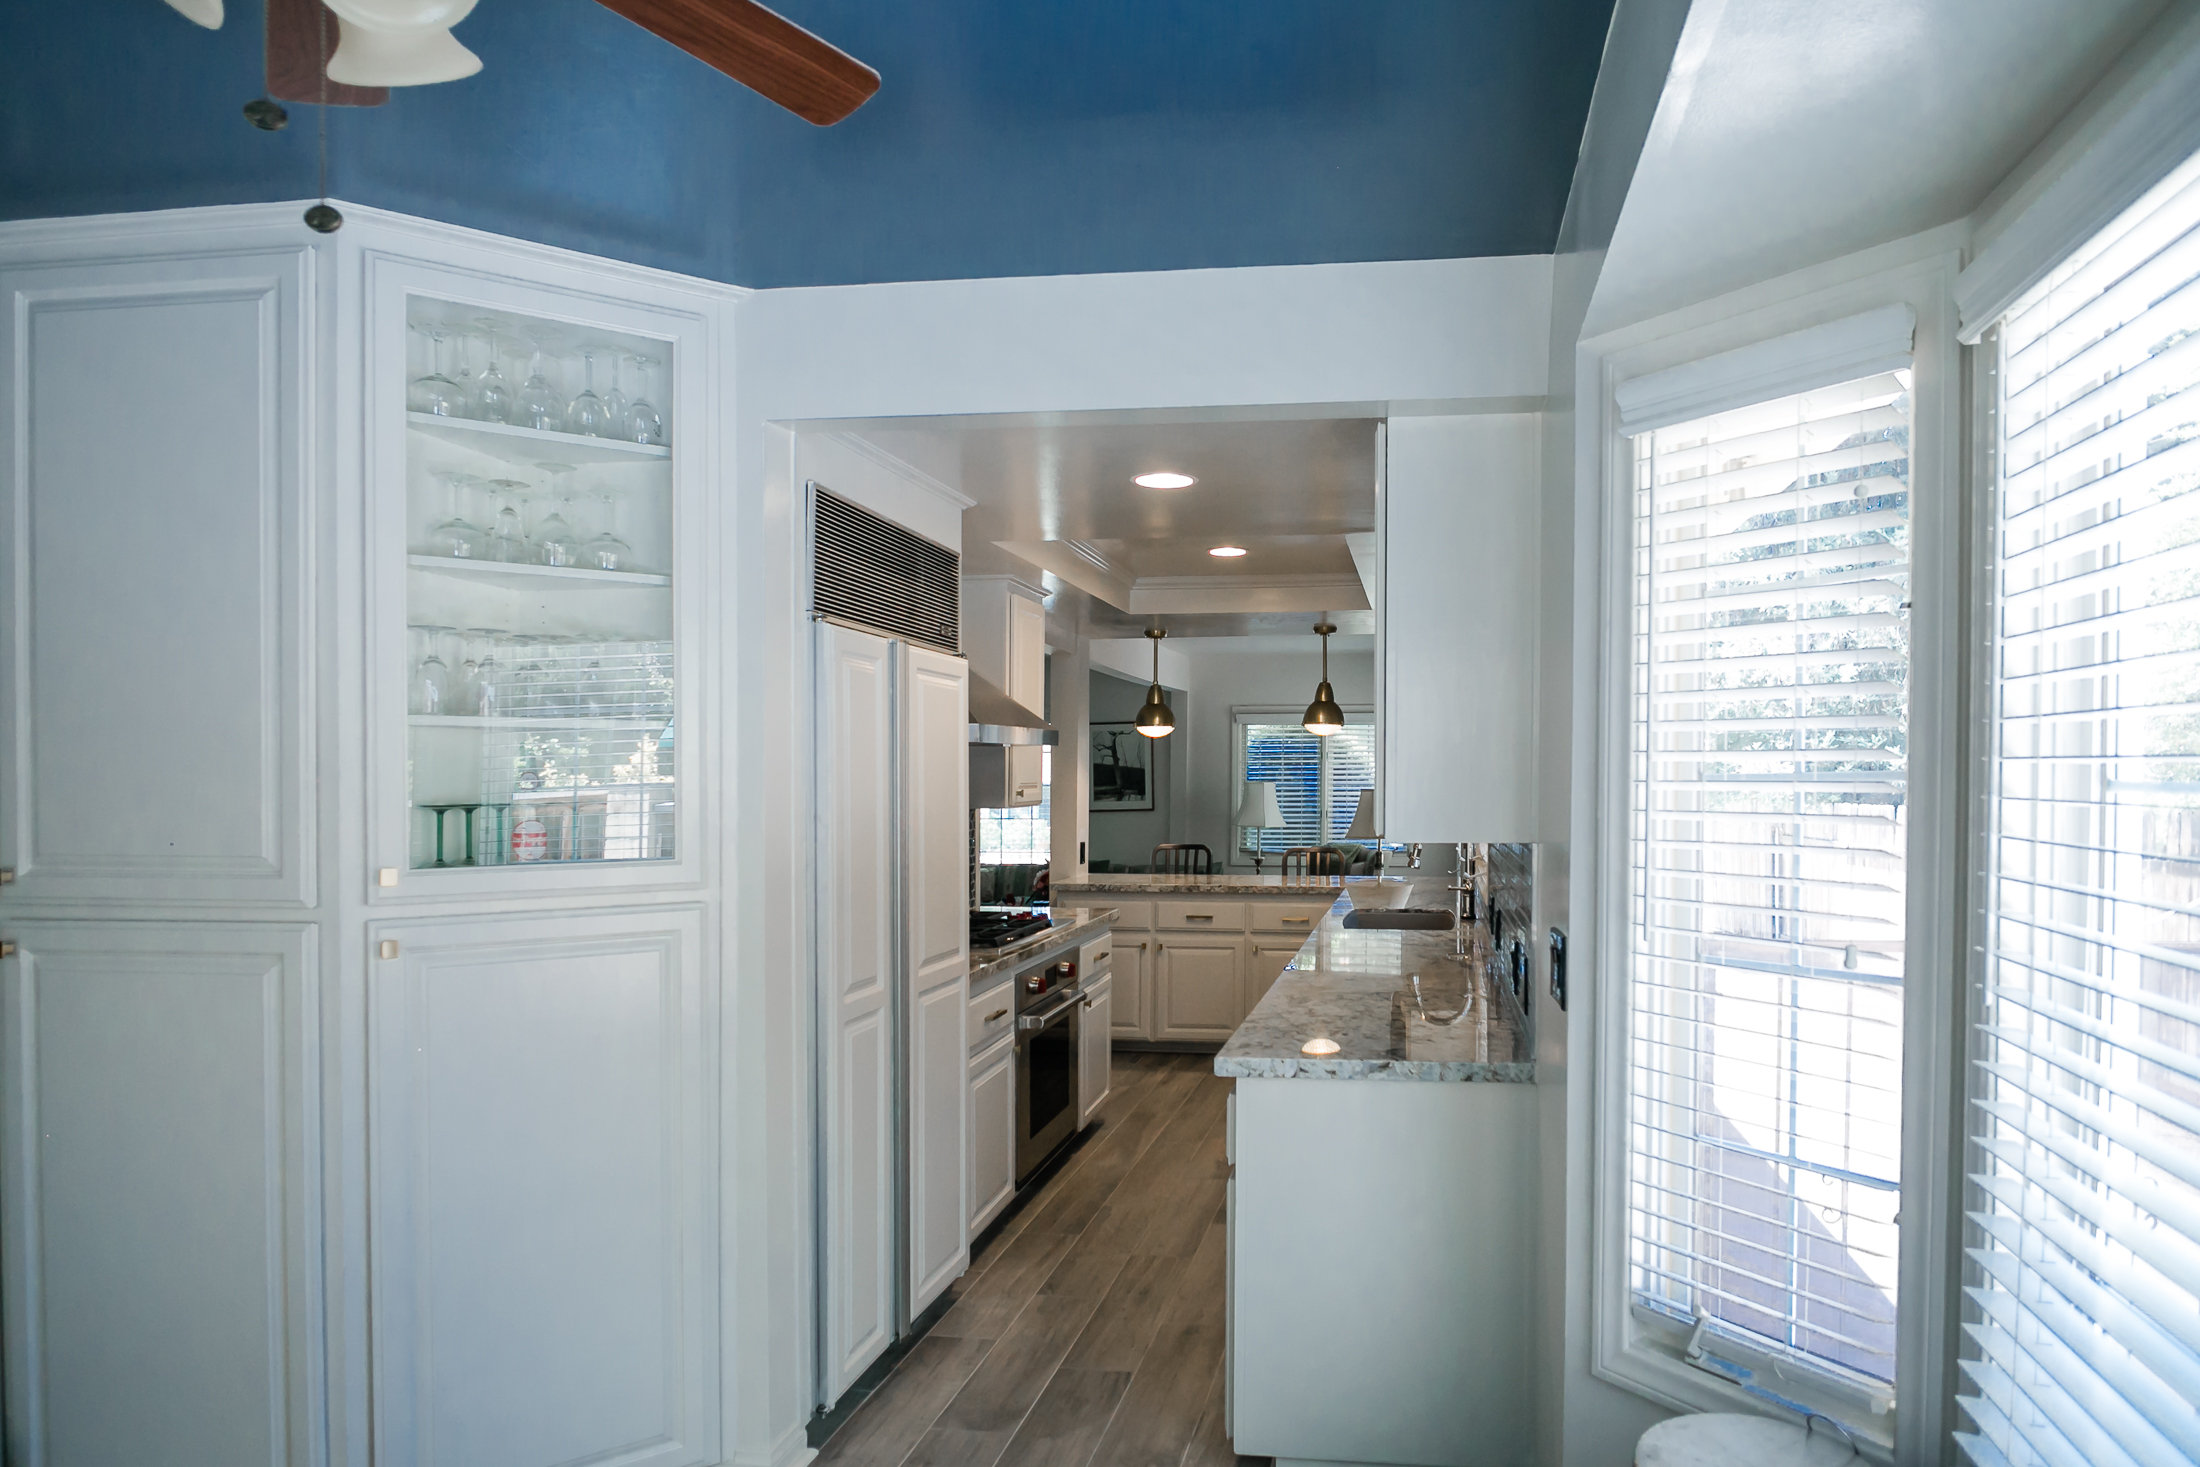 very blue kitchen, Kitchen, Dining Room, remodel, painted ceiling, dmv interior designer, bowie maryland, washington dc